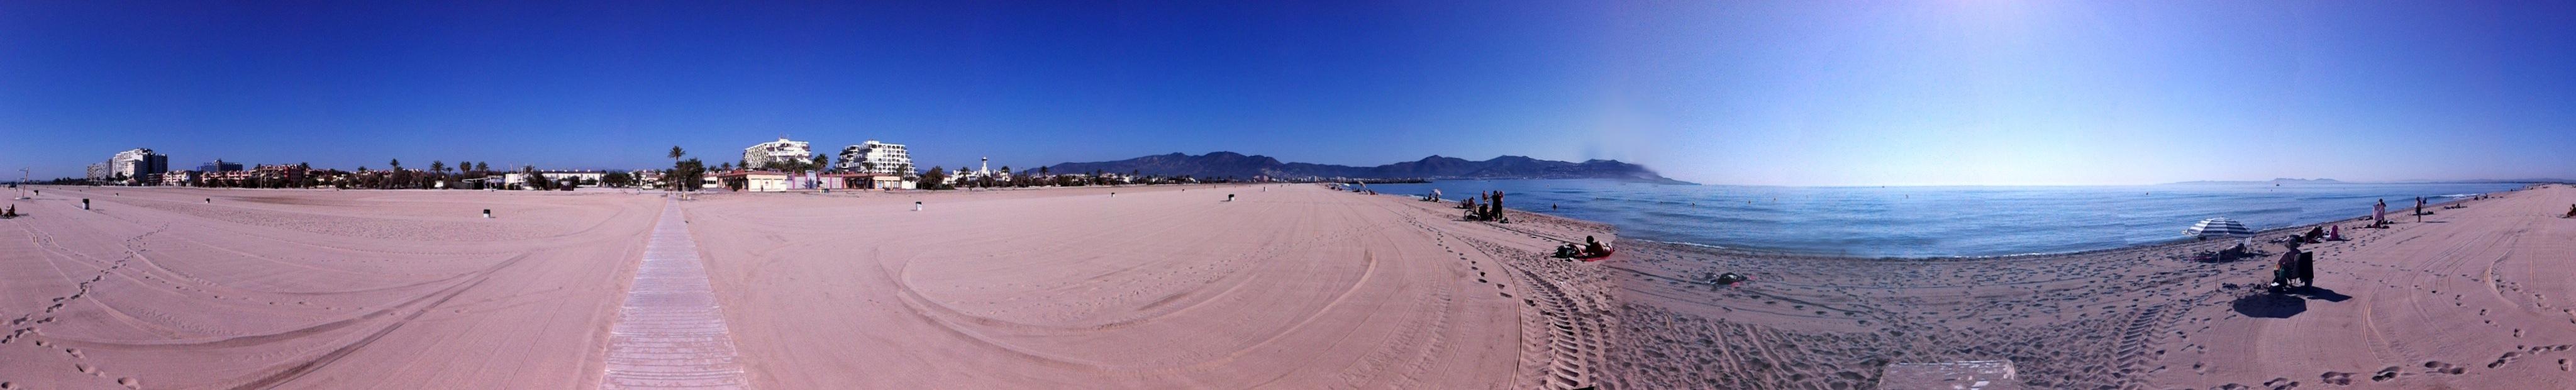 pano-empuria-beach.jpg